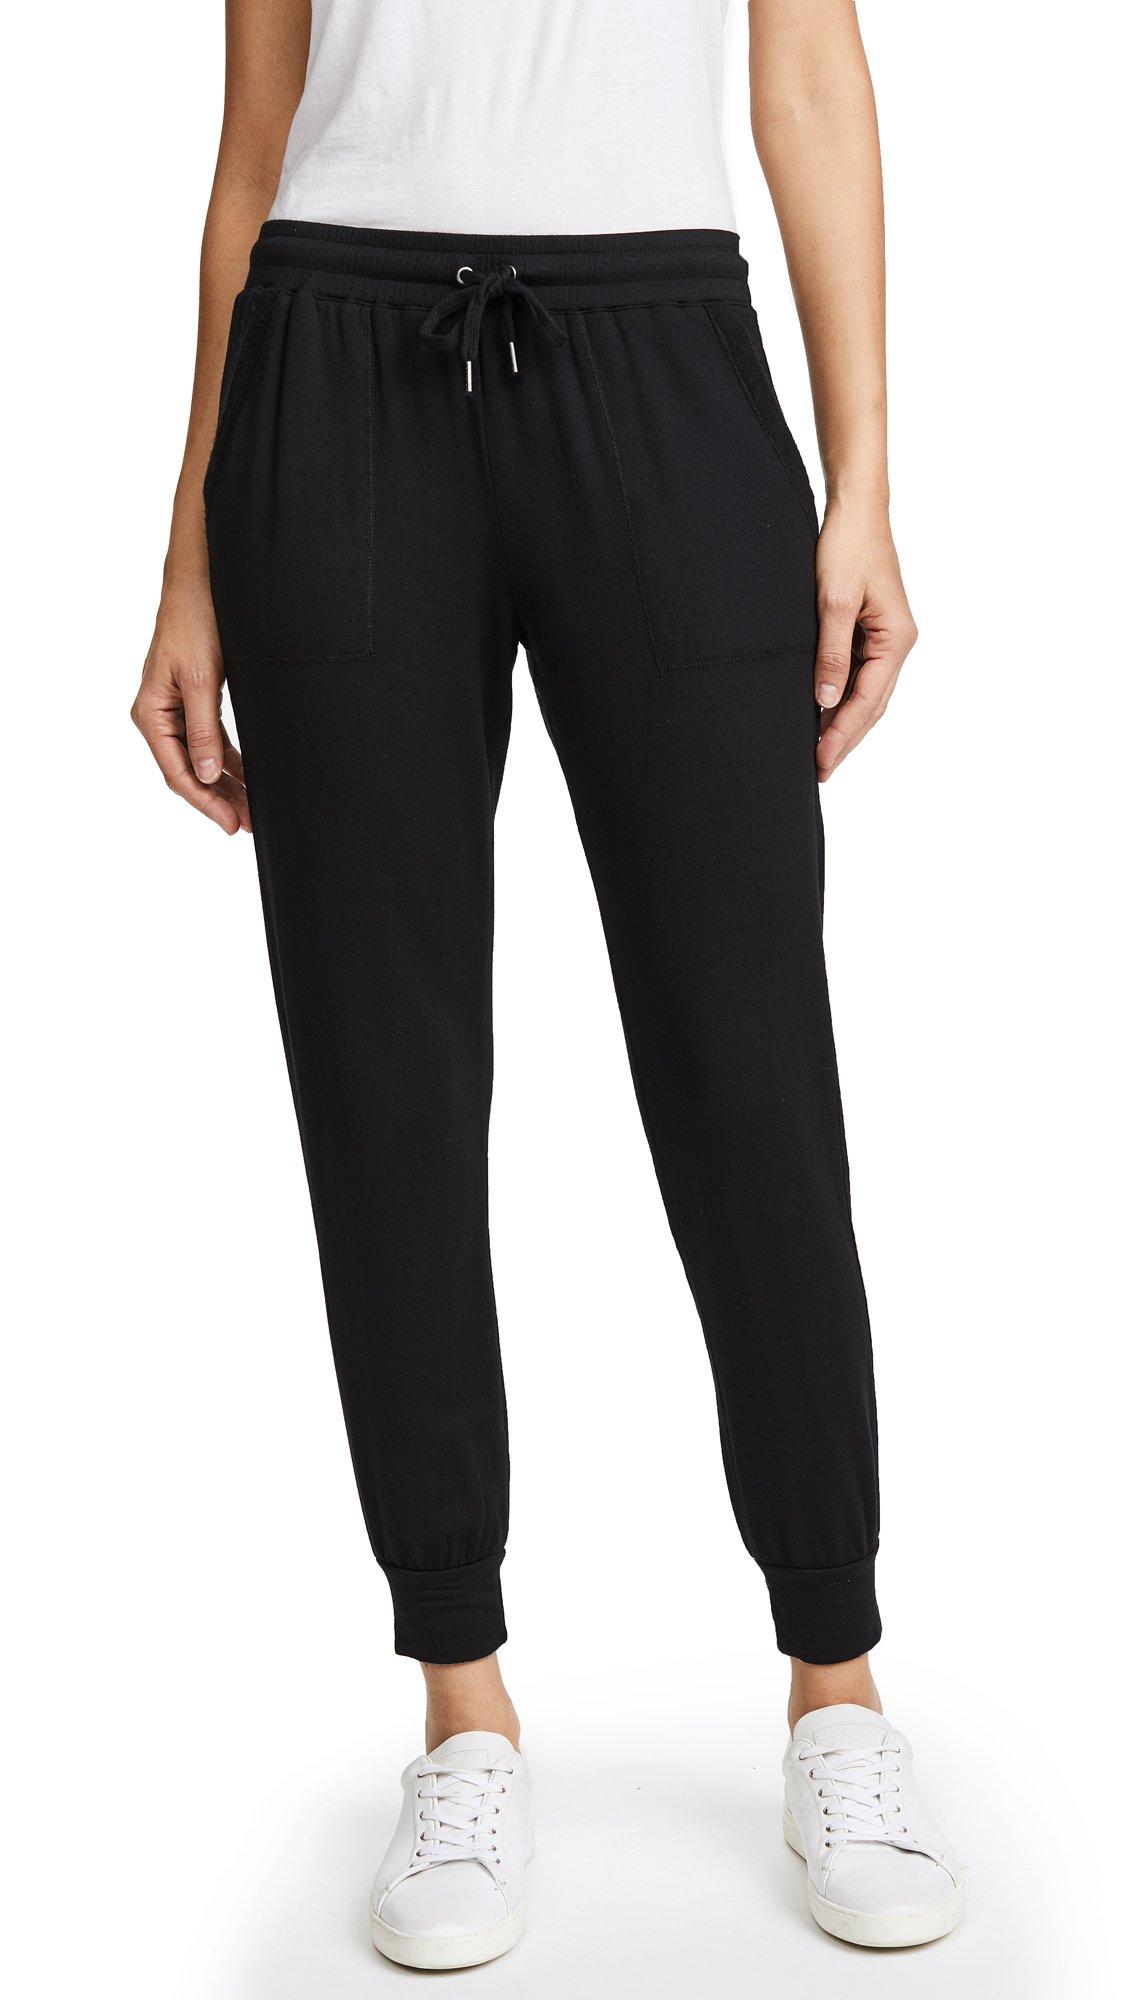 Splendid Women's Forward Seam Pant, Black, L